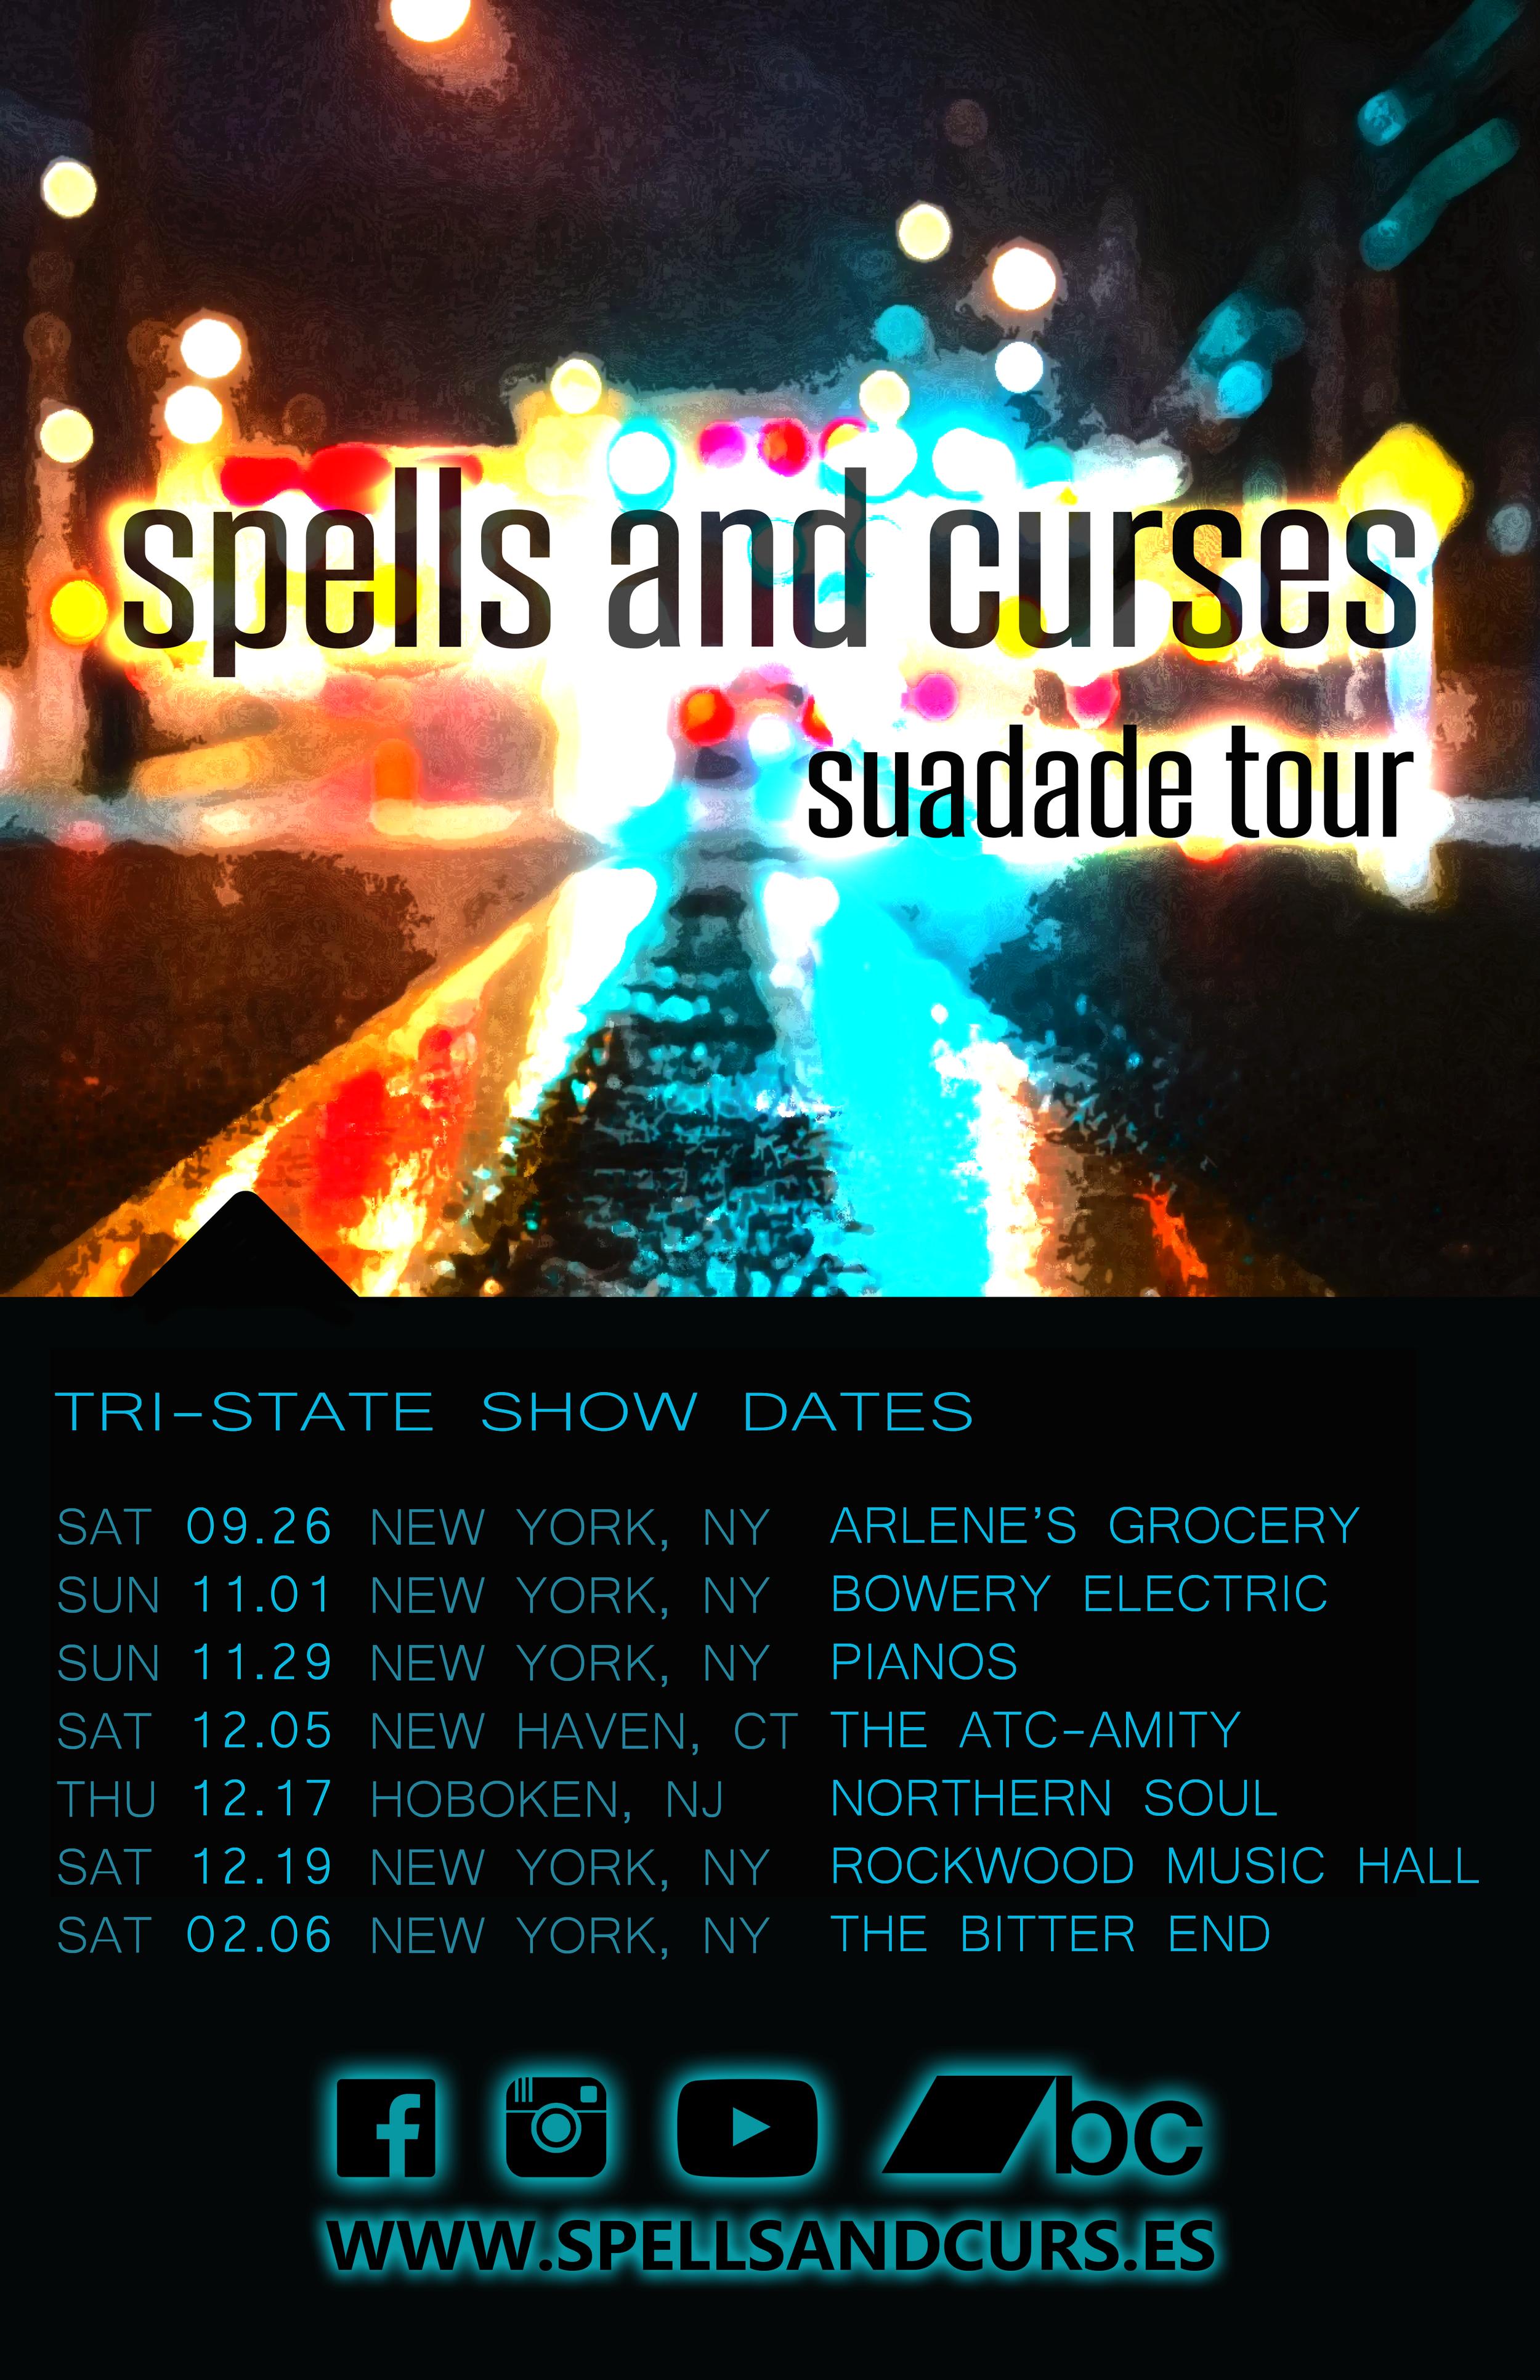 SPELLSANDCURSES-SUADADE-TOUR_UPDATED-12.09.15-copy.png